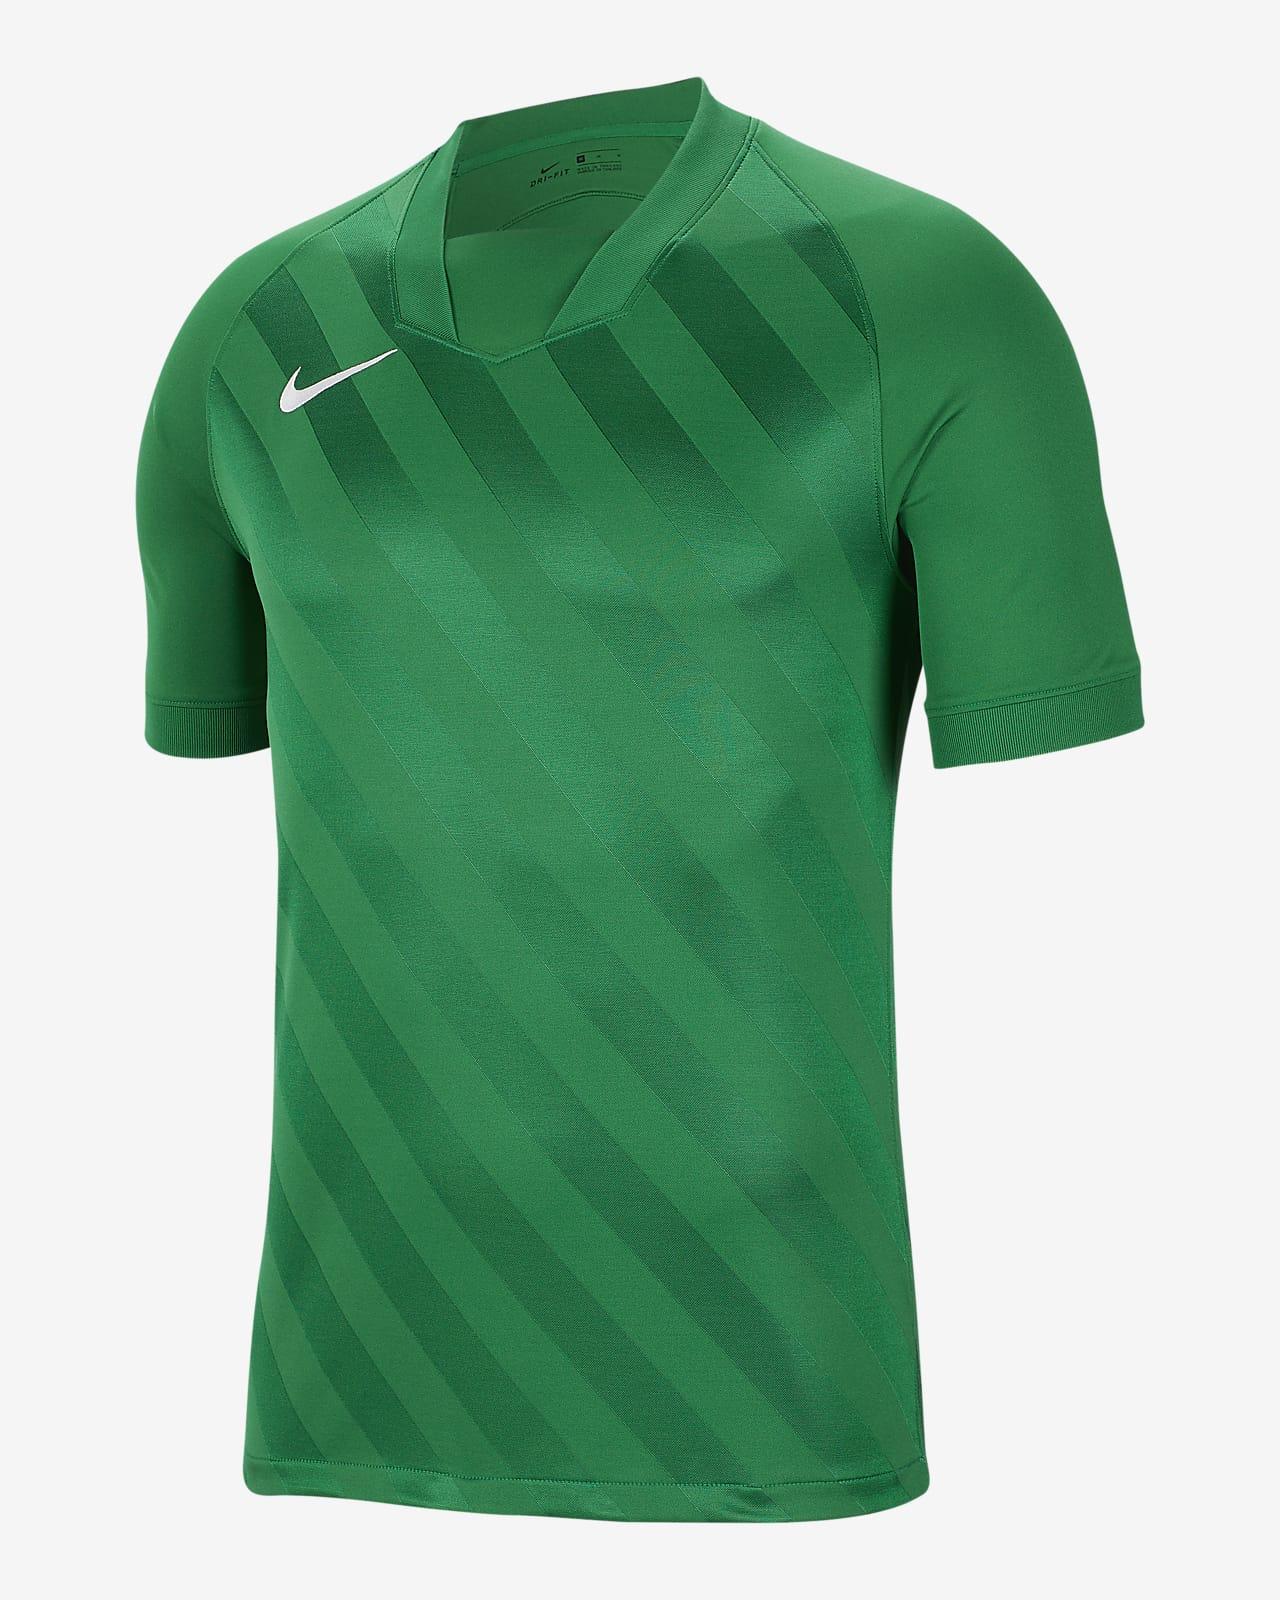 Męska koszulka piłkarska Nike Dri FIT Challenge 3